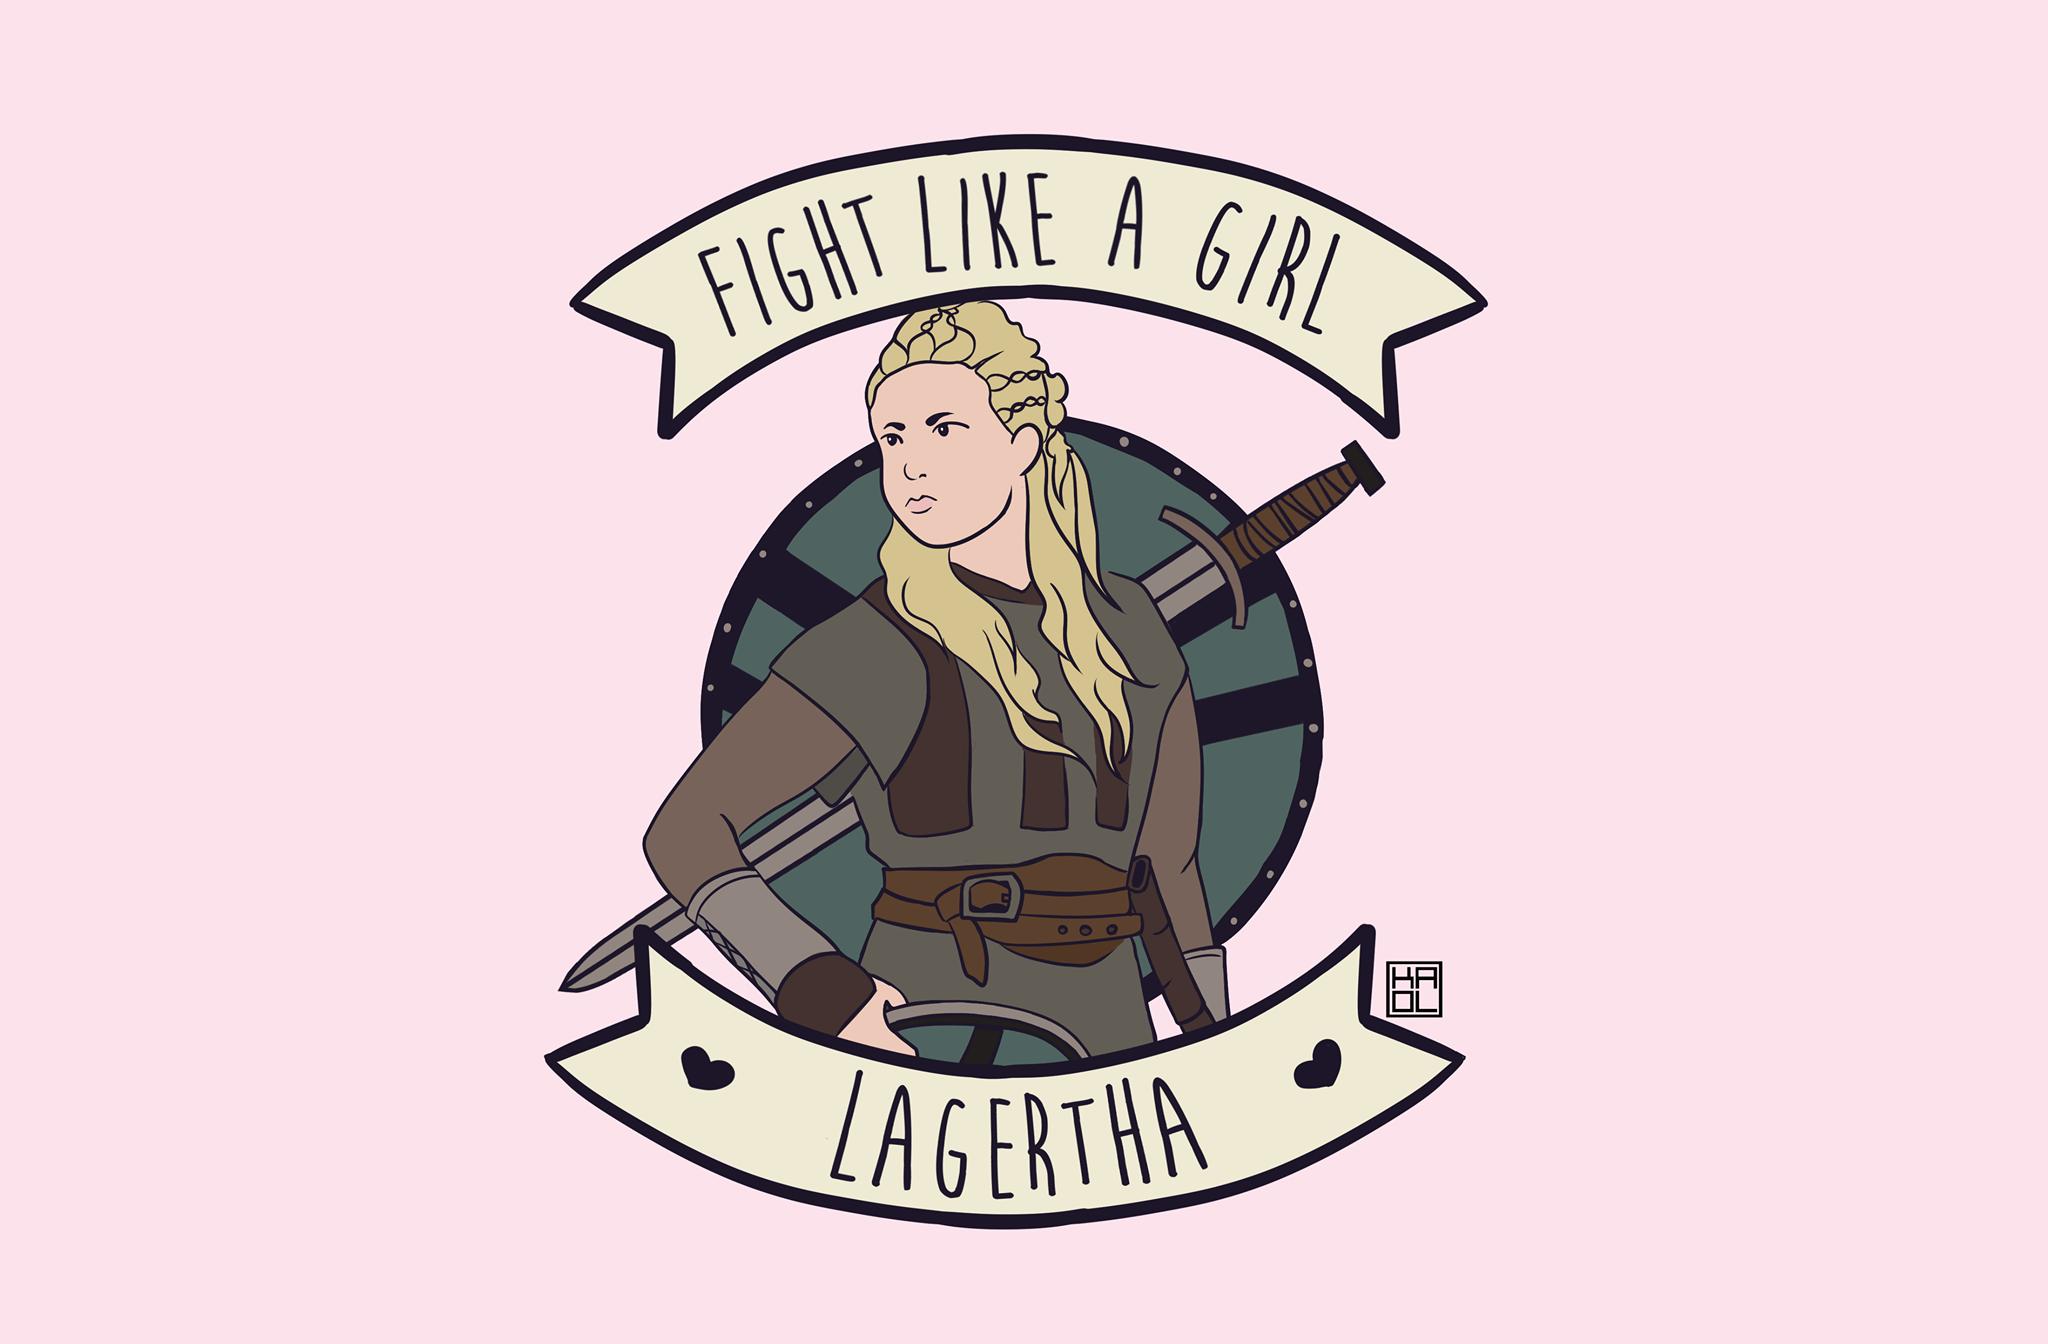 Fight Like A Girl Lagertha, Hay una lesbiana en mi sopa